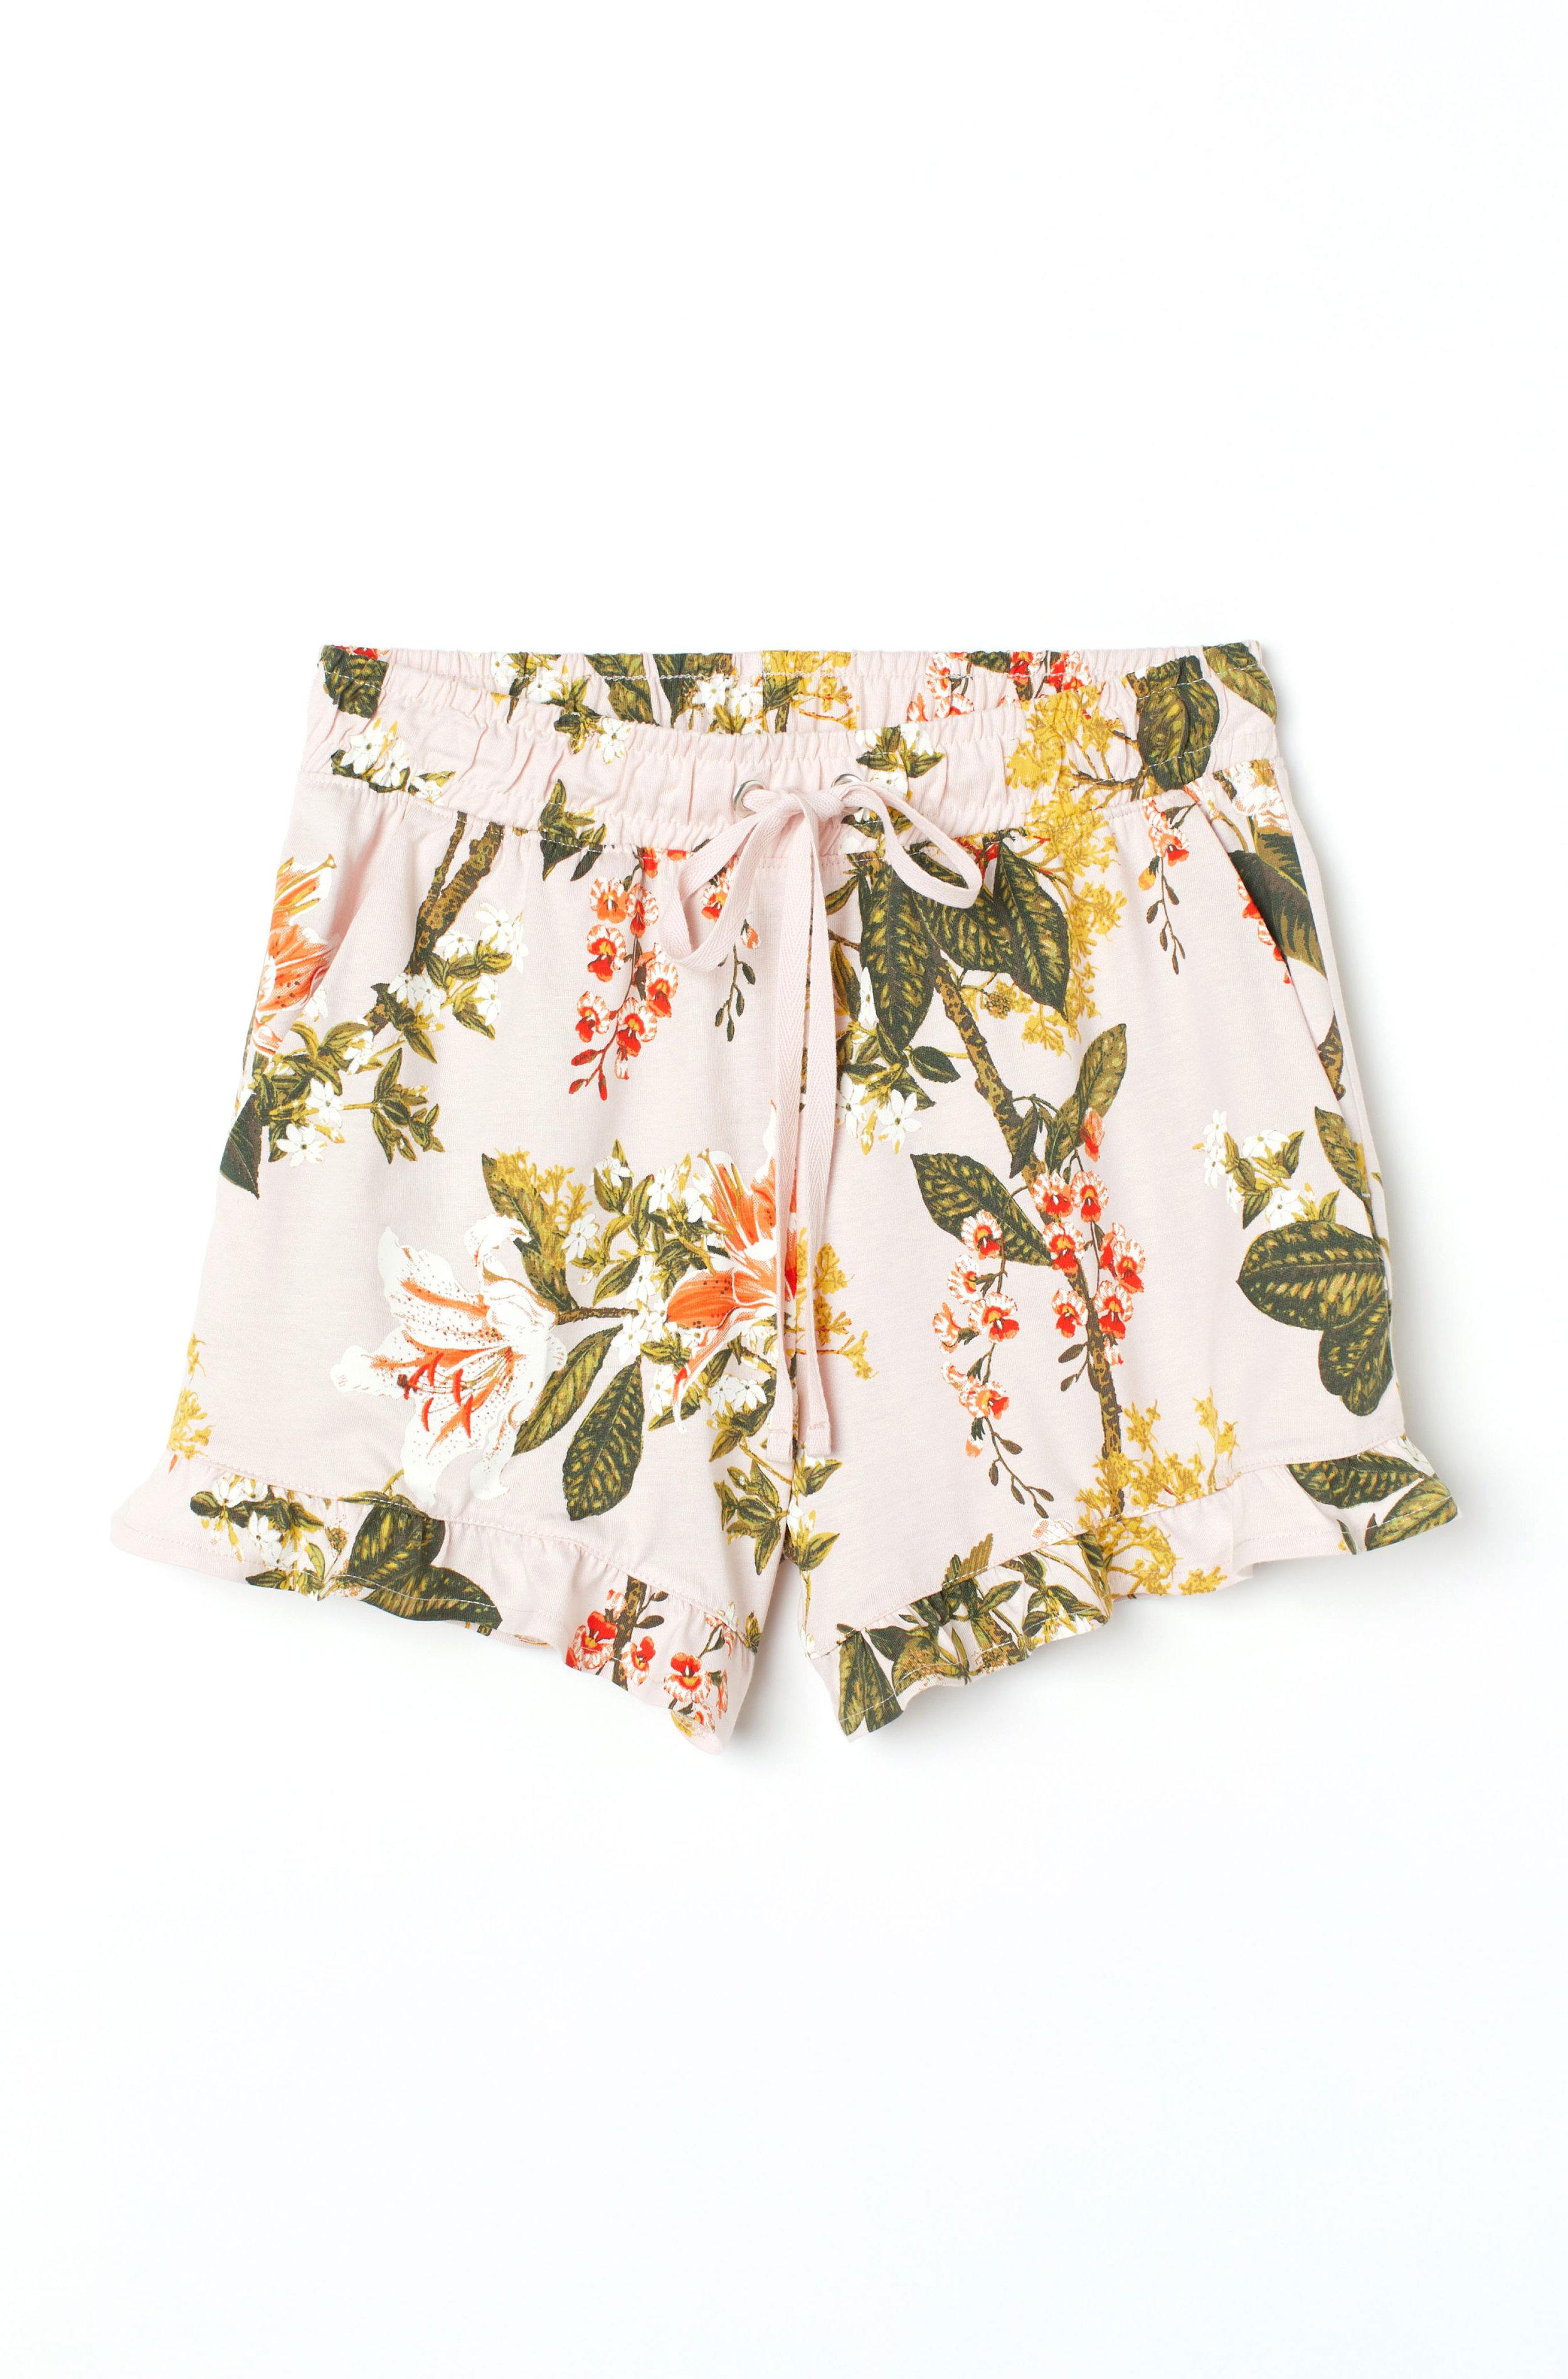 H&M Tropical Shorts     $12.99